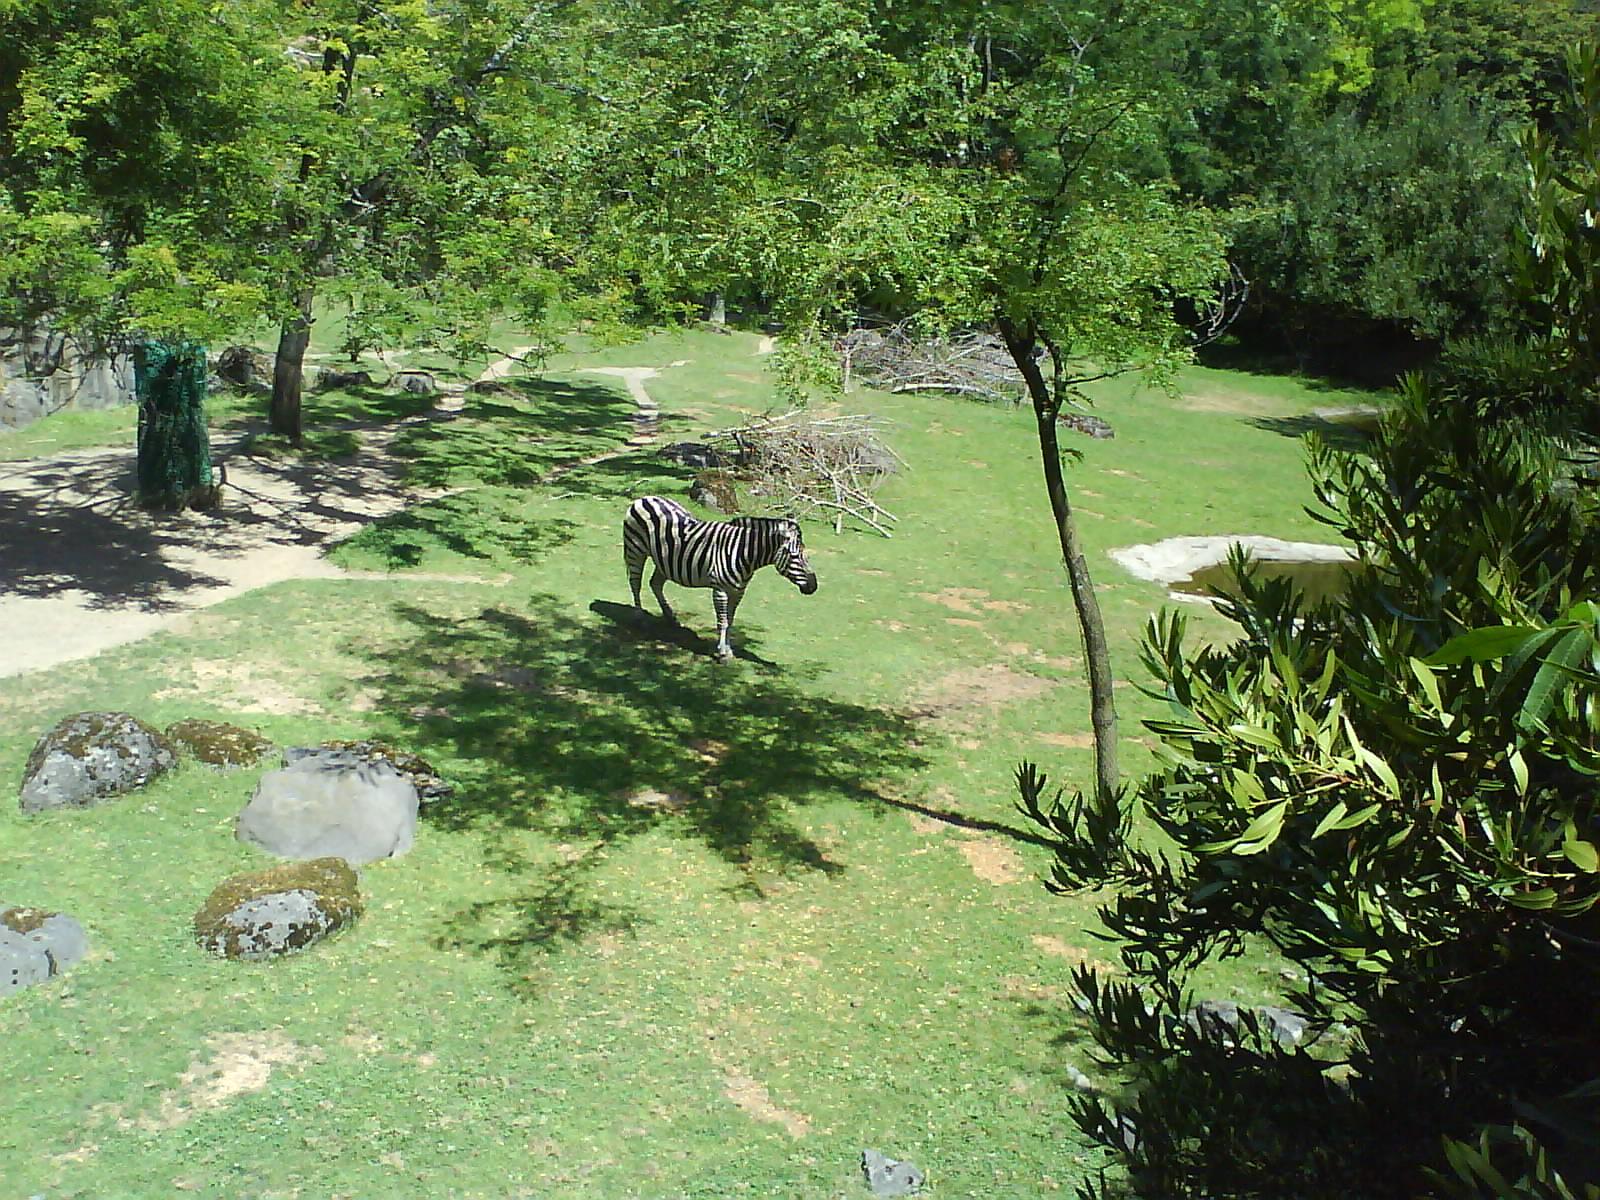 [Zebra]